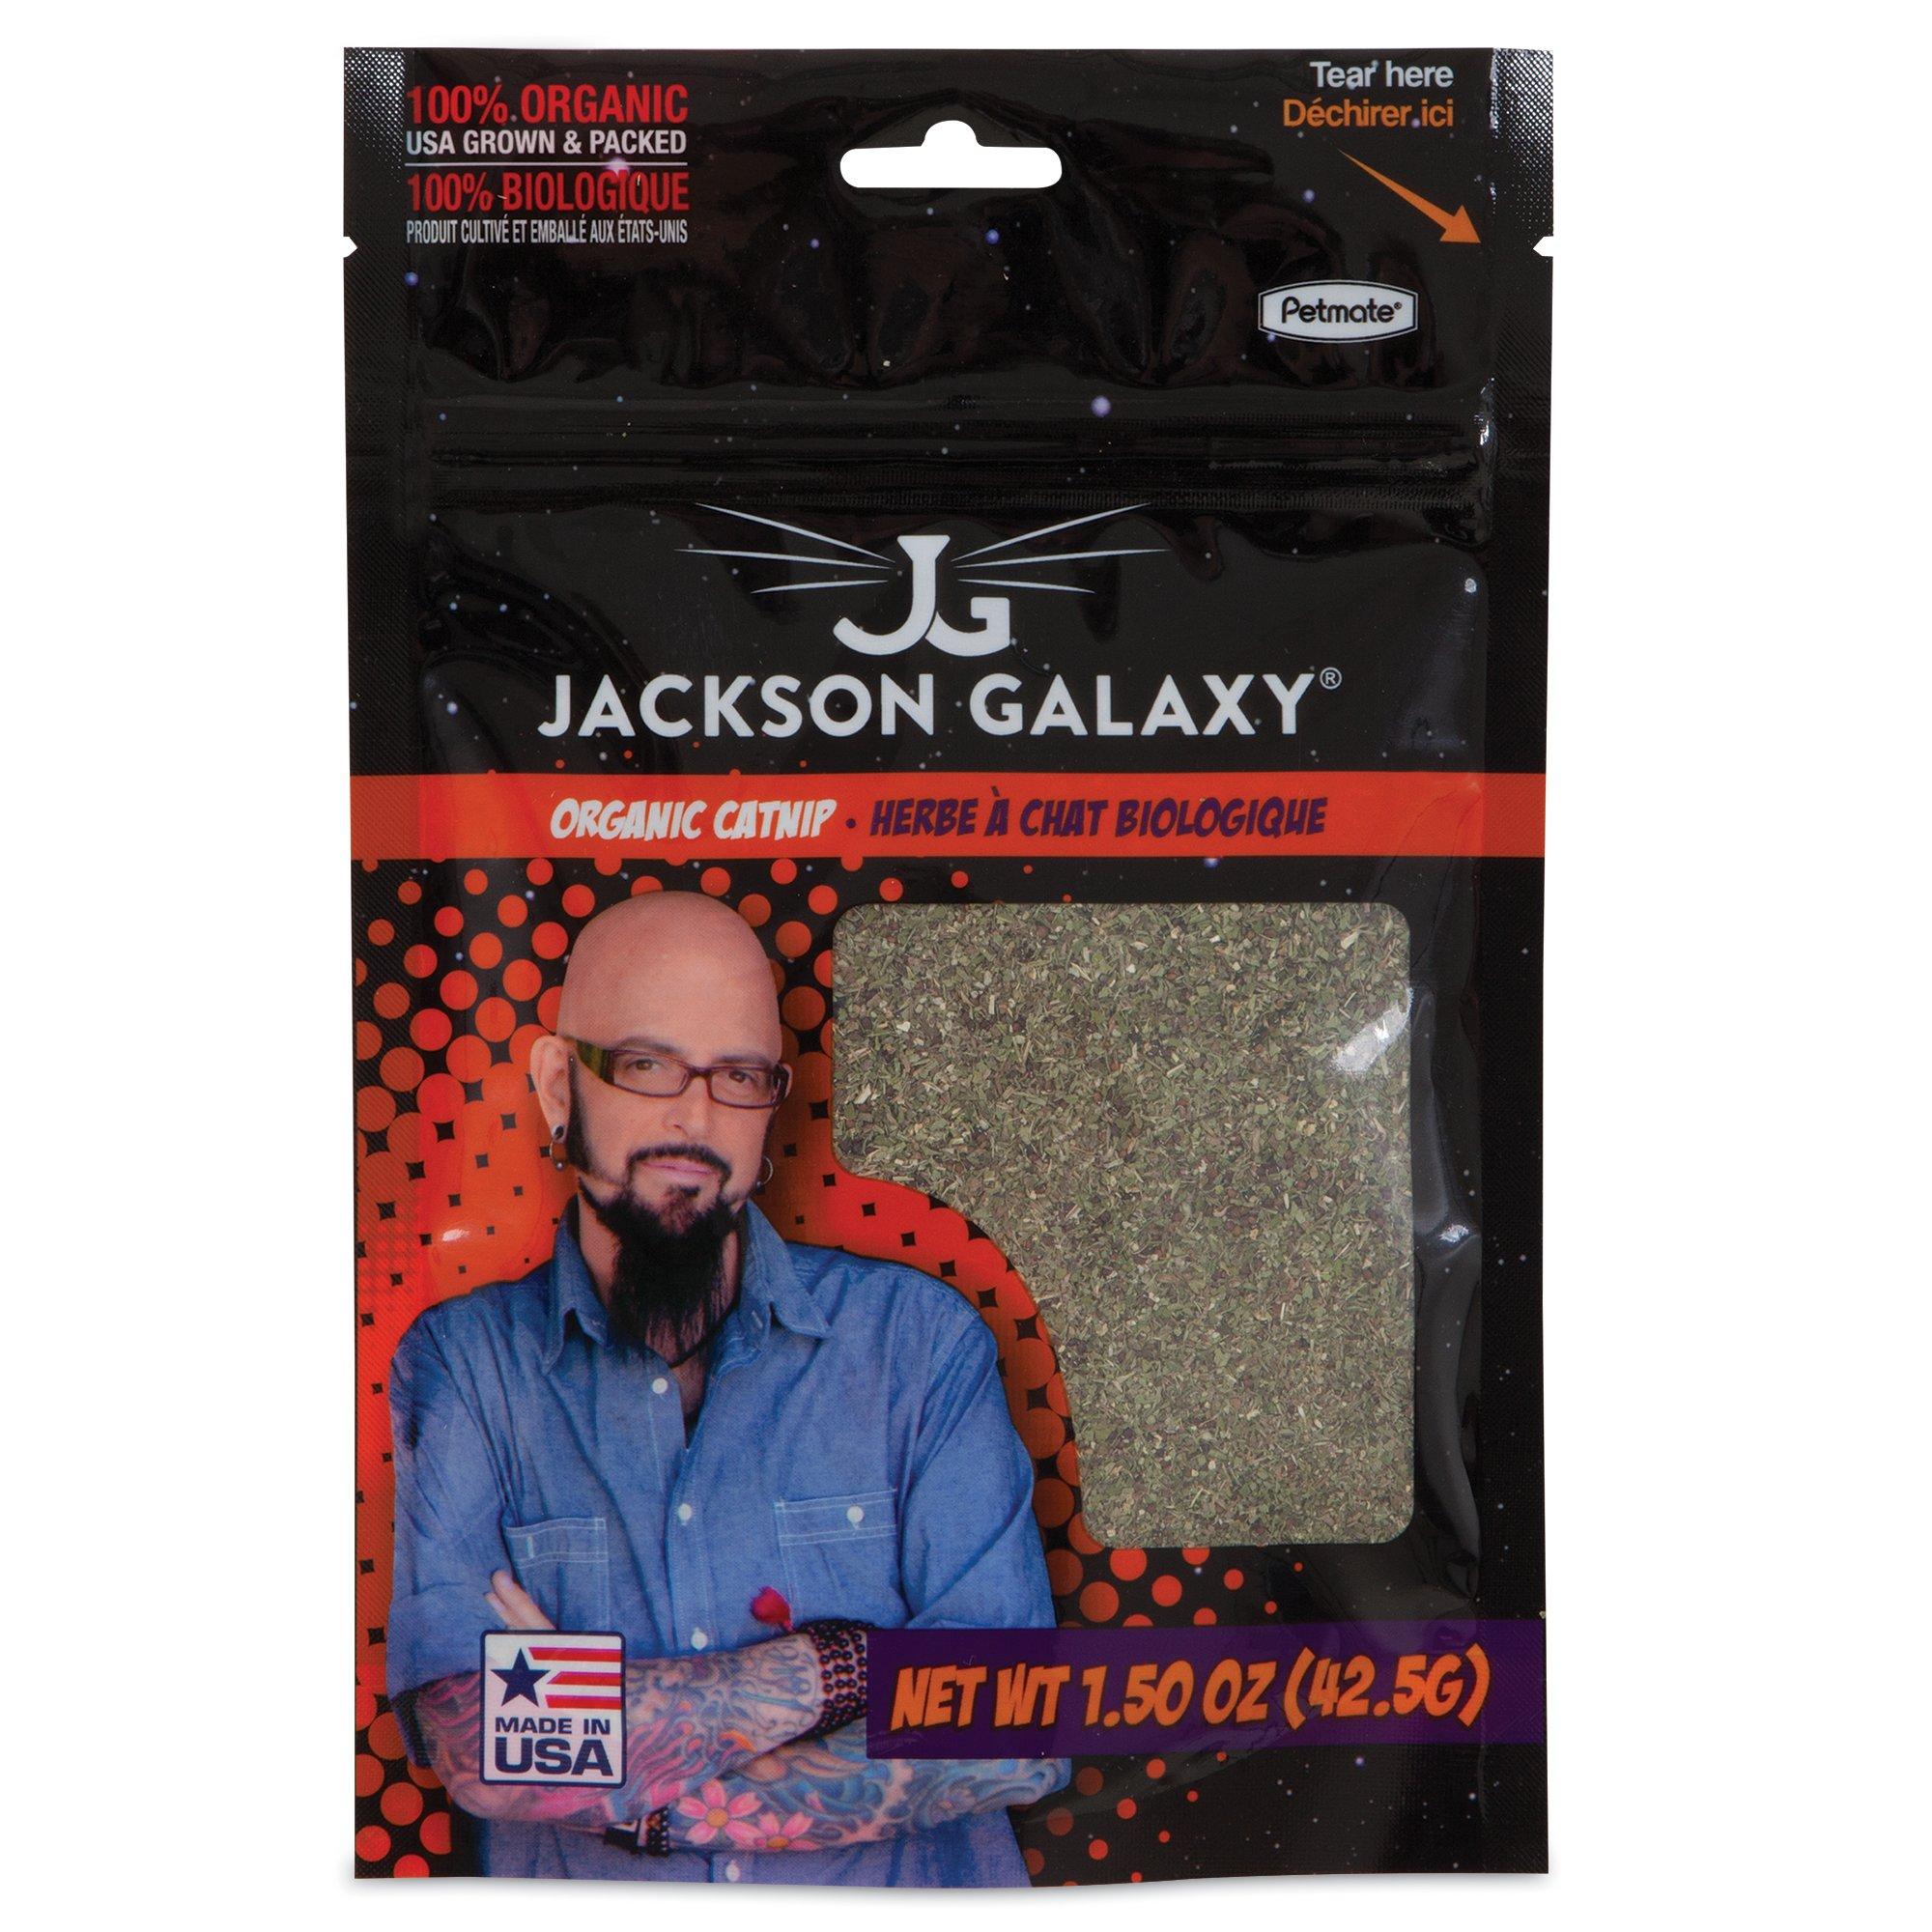 Petmate jackson galaxy organic catnip petco for Jackson galaxy phone number